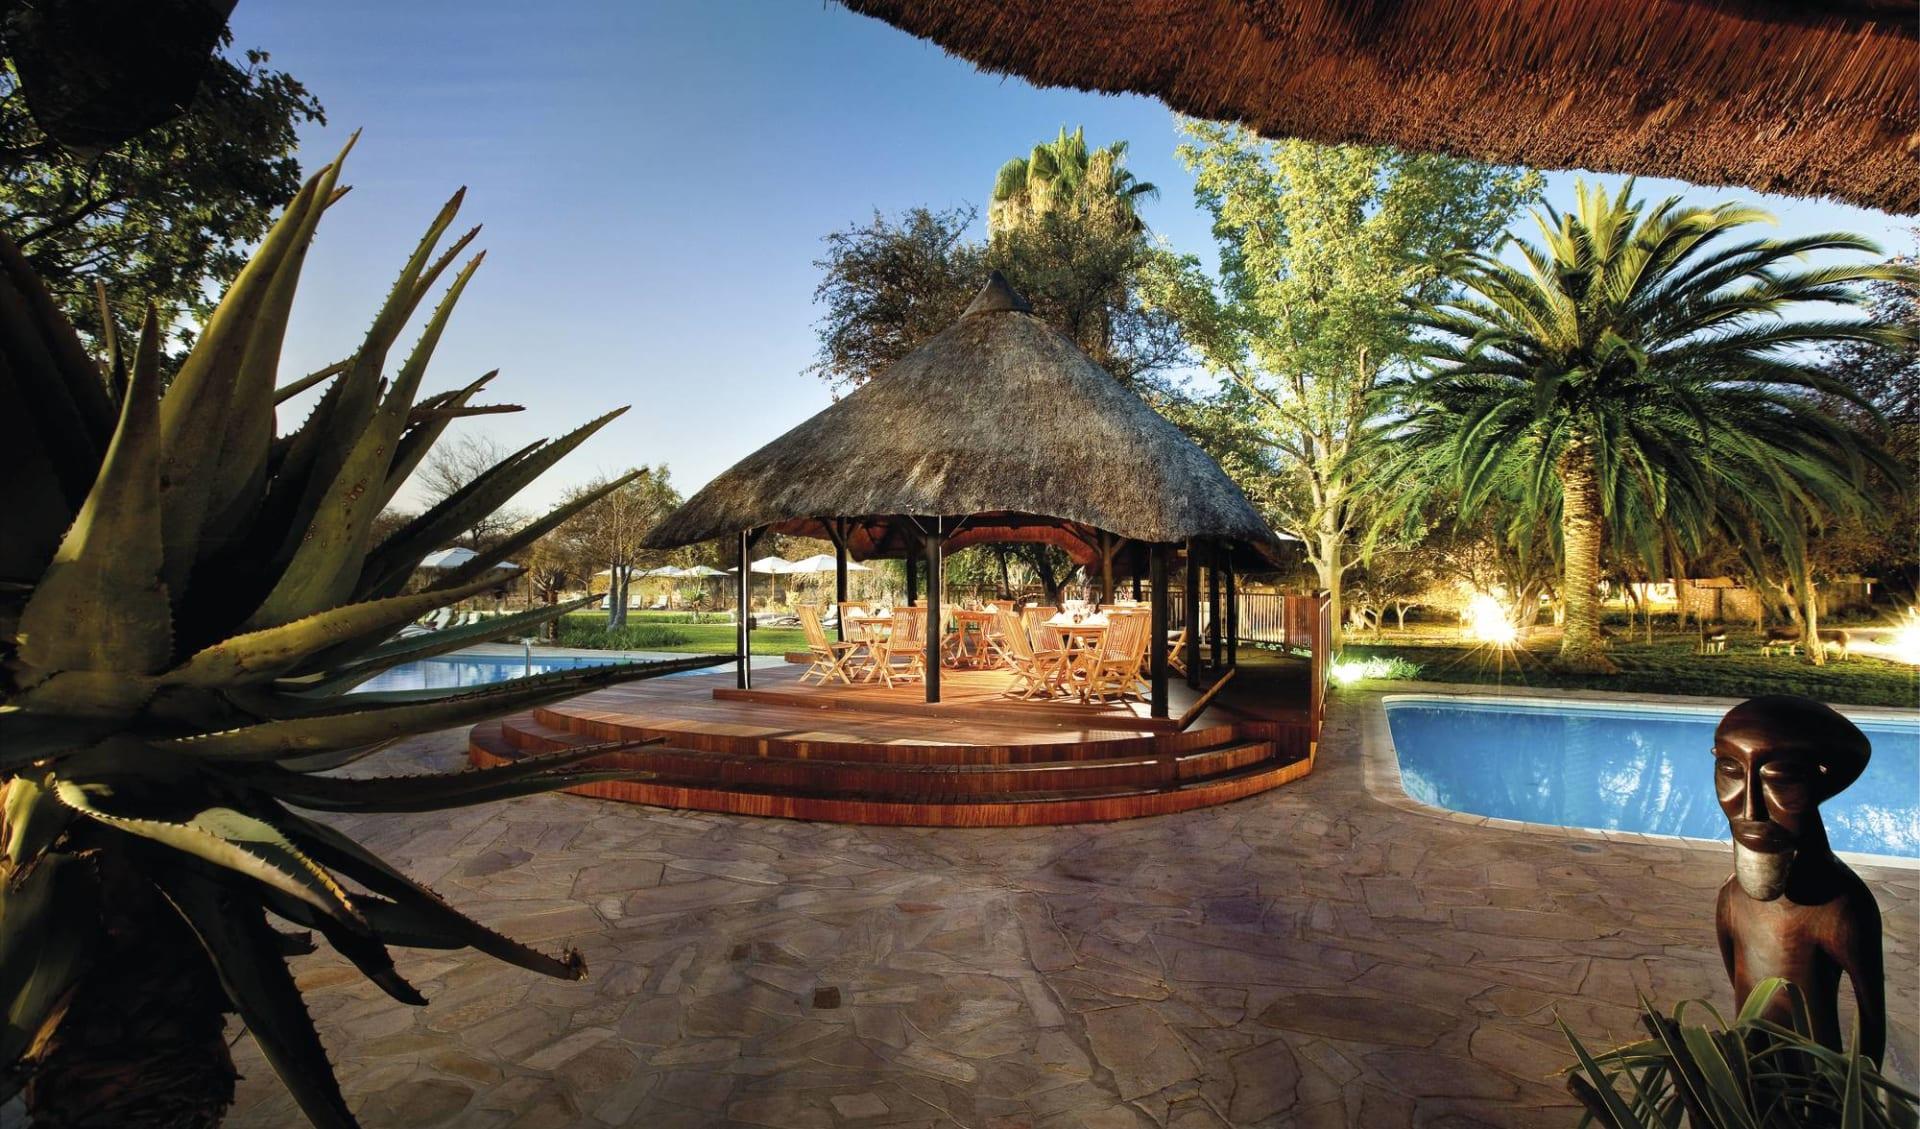 Mokuti Etosha Lodge in Etosha Nationalpark:  Mokuti Etosha Lodge - Garten mit Pool